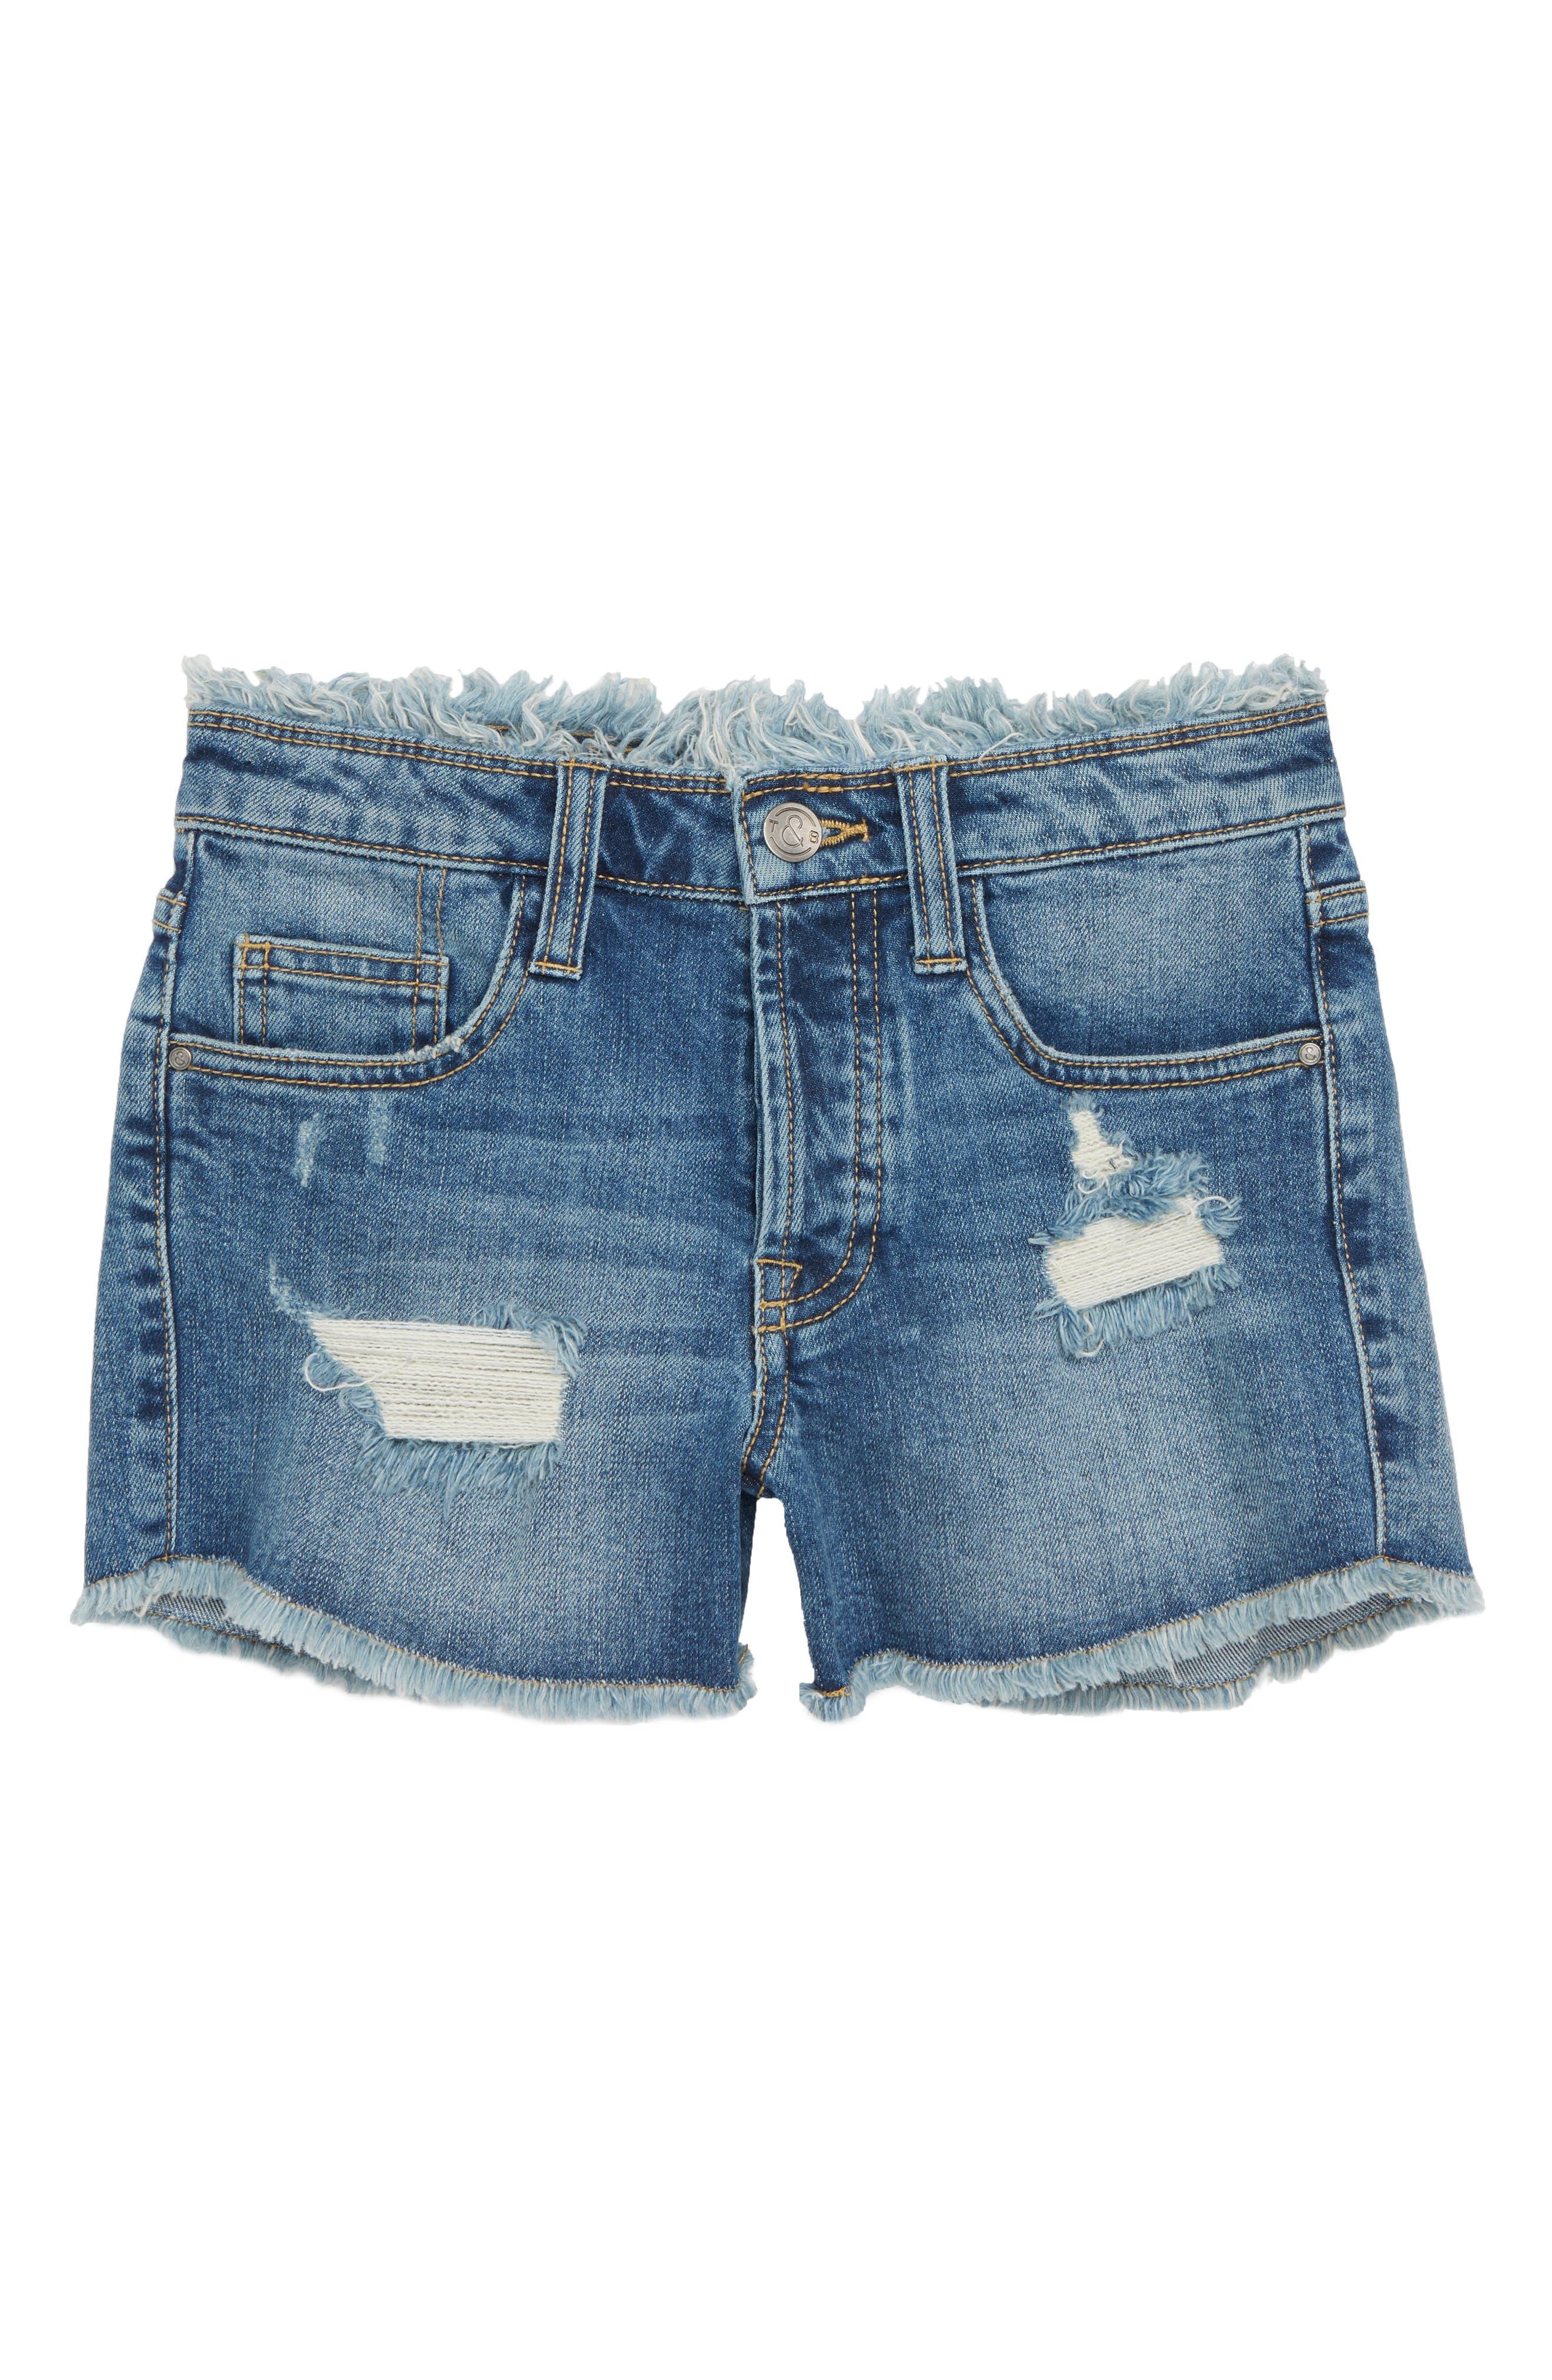 Festival Distressed Cutoff Denim Shorts,                         Main,                         color, 401